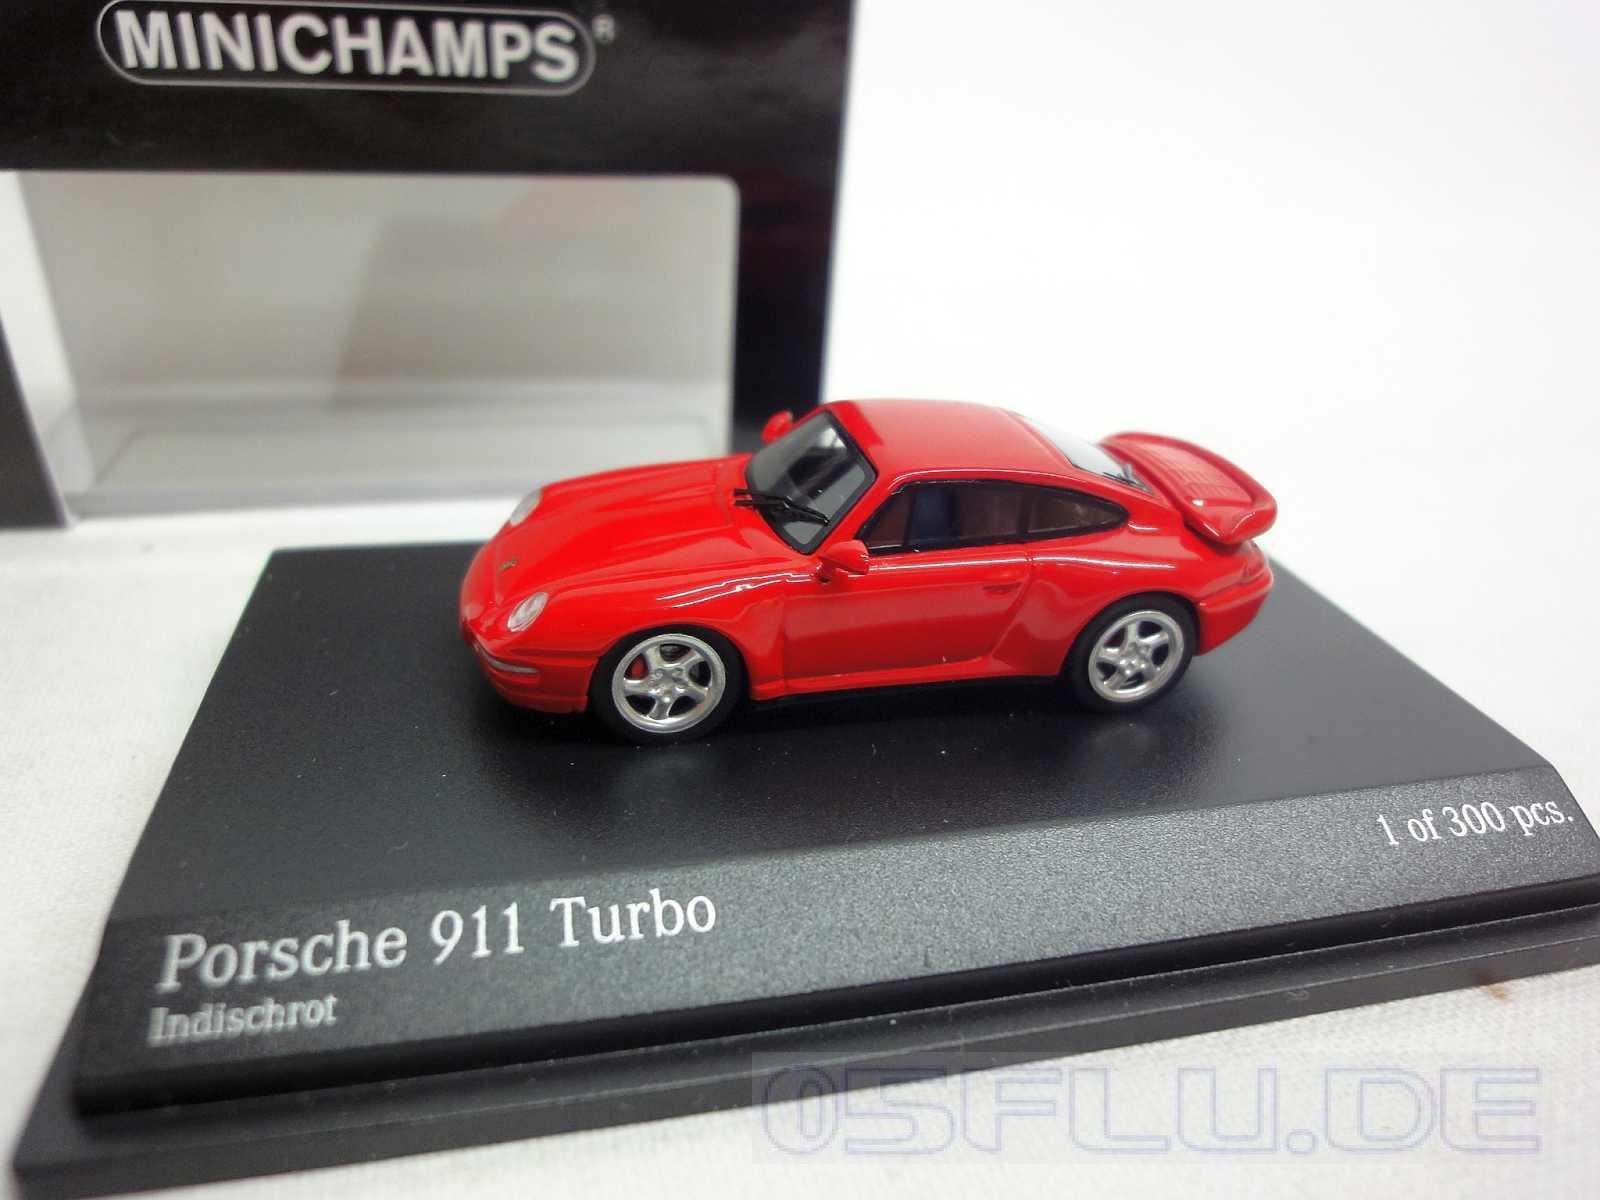 minichamps 1 87 877069202 porsche 911 993 turbo 1995 red nur 1 tag ebay. Black Bedroom Furniture Sets. Home Design Ideas